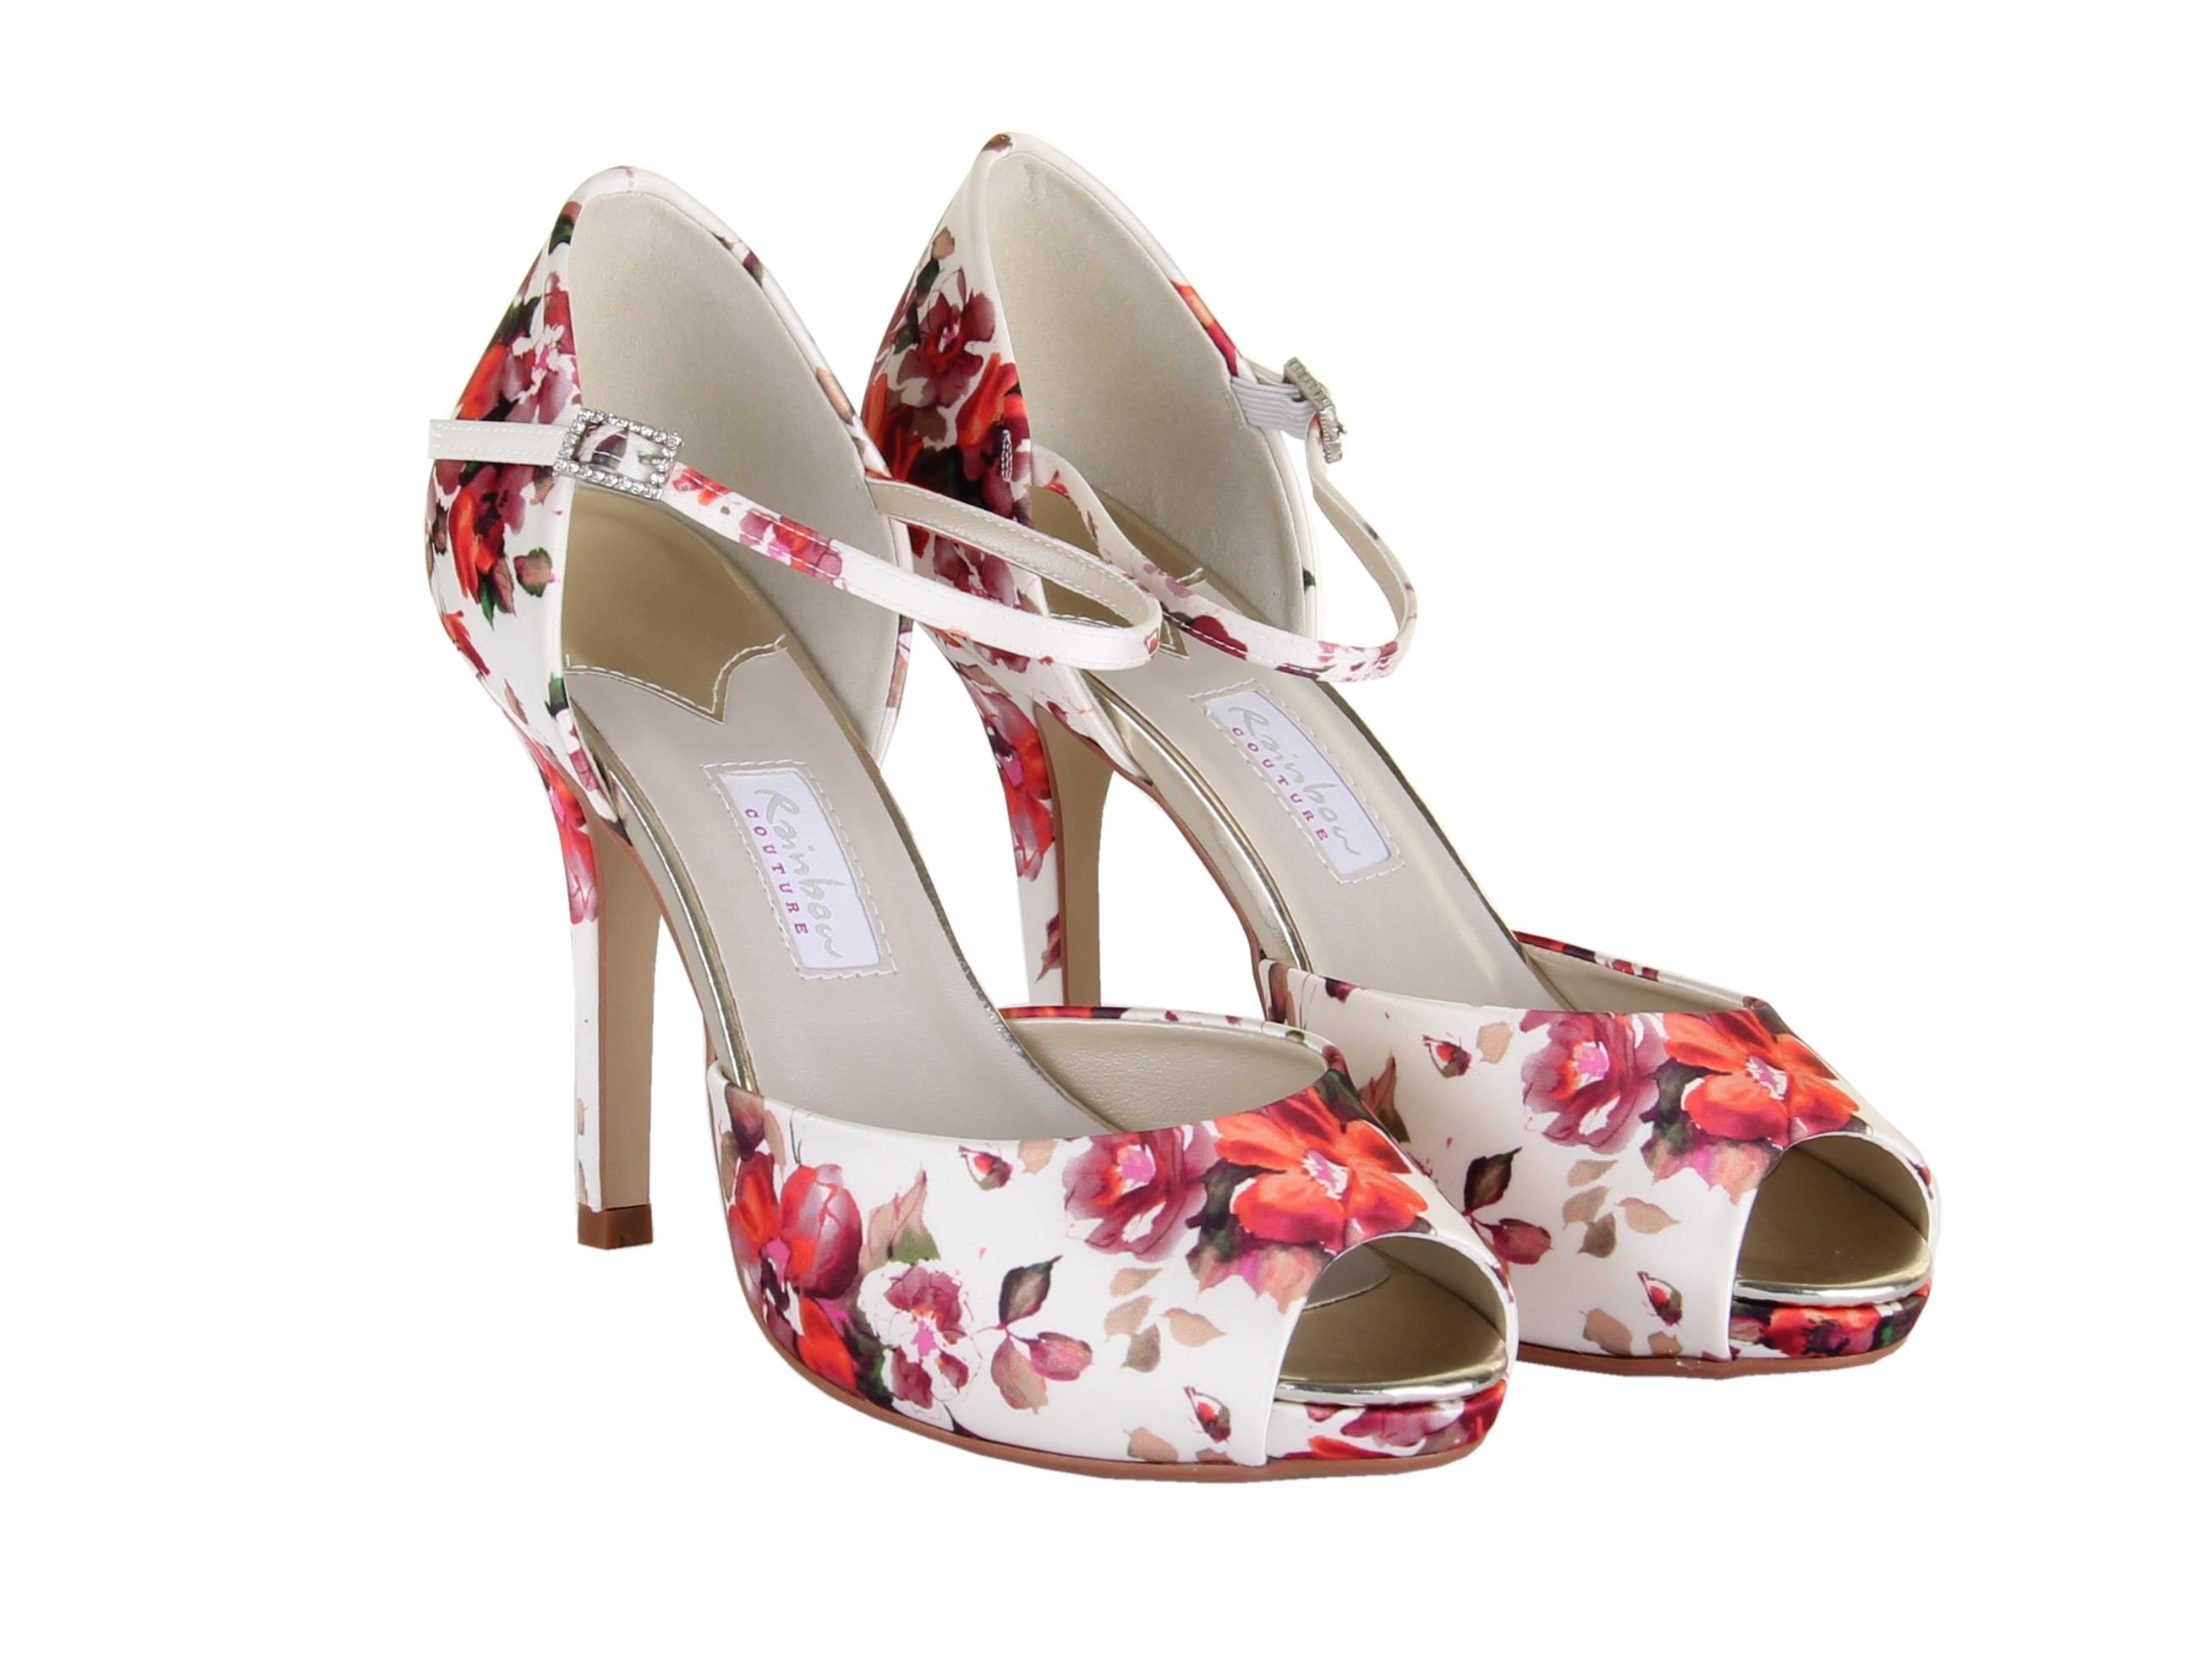 83ea44a73567 Rainbow Club Gabriella Floral Satin Women Peep Toe Shoe UK Size 3-8 ...